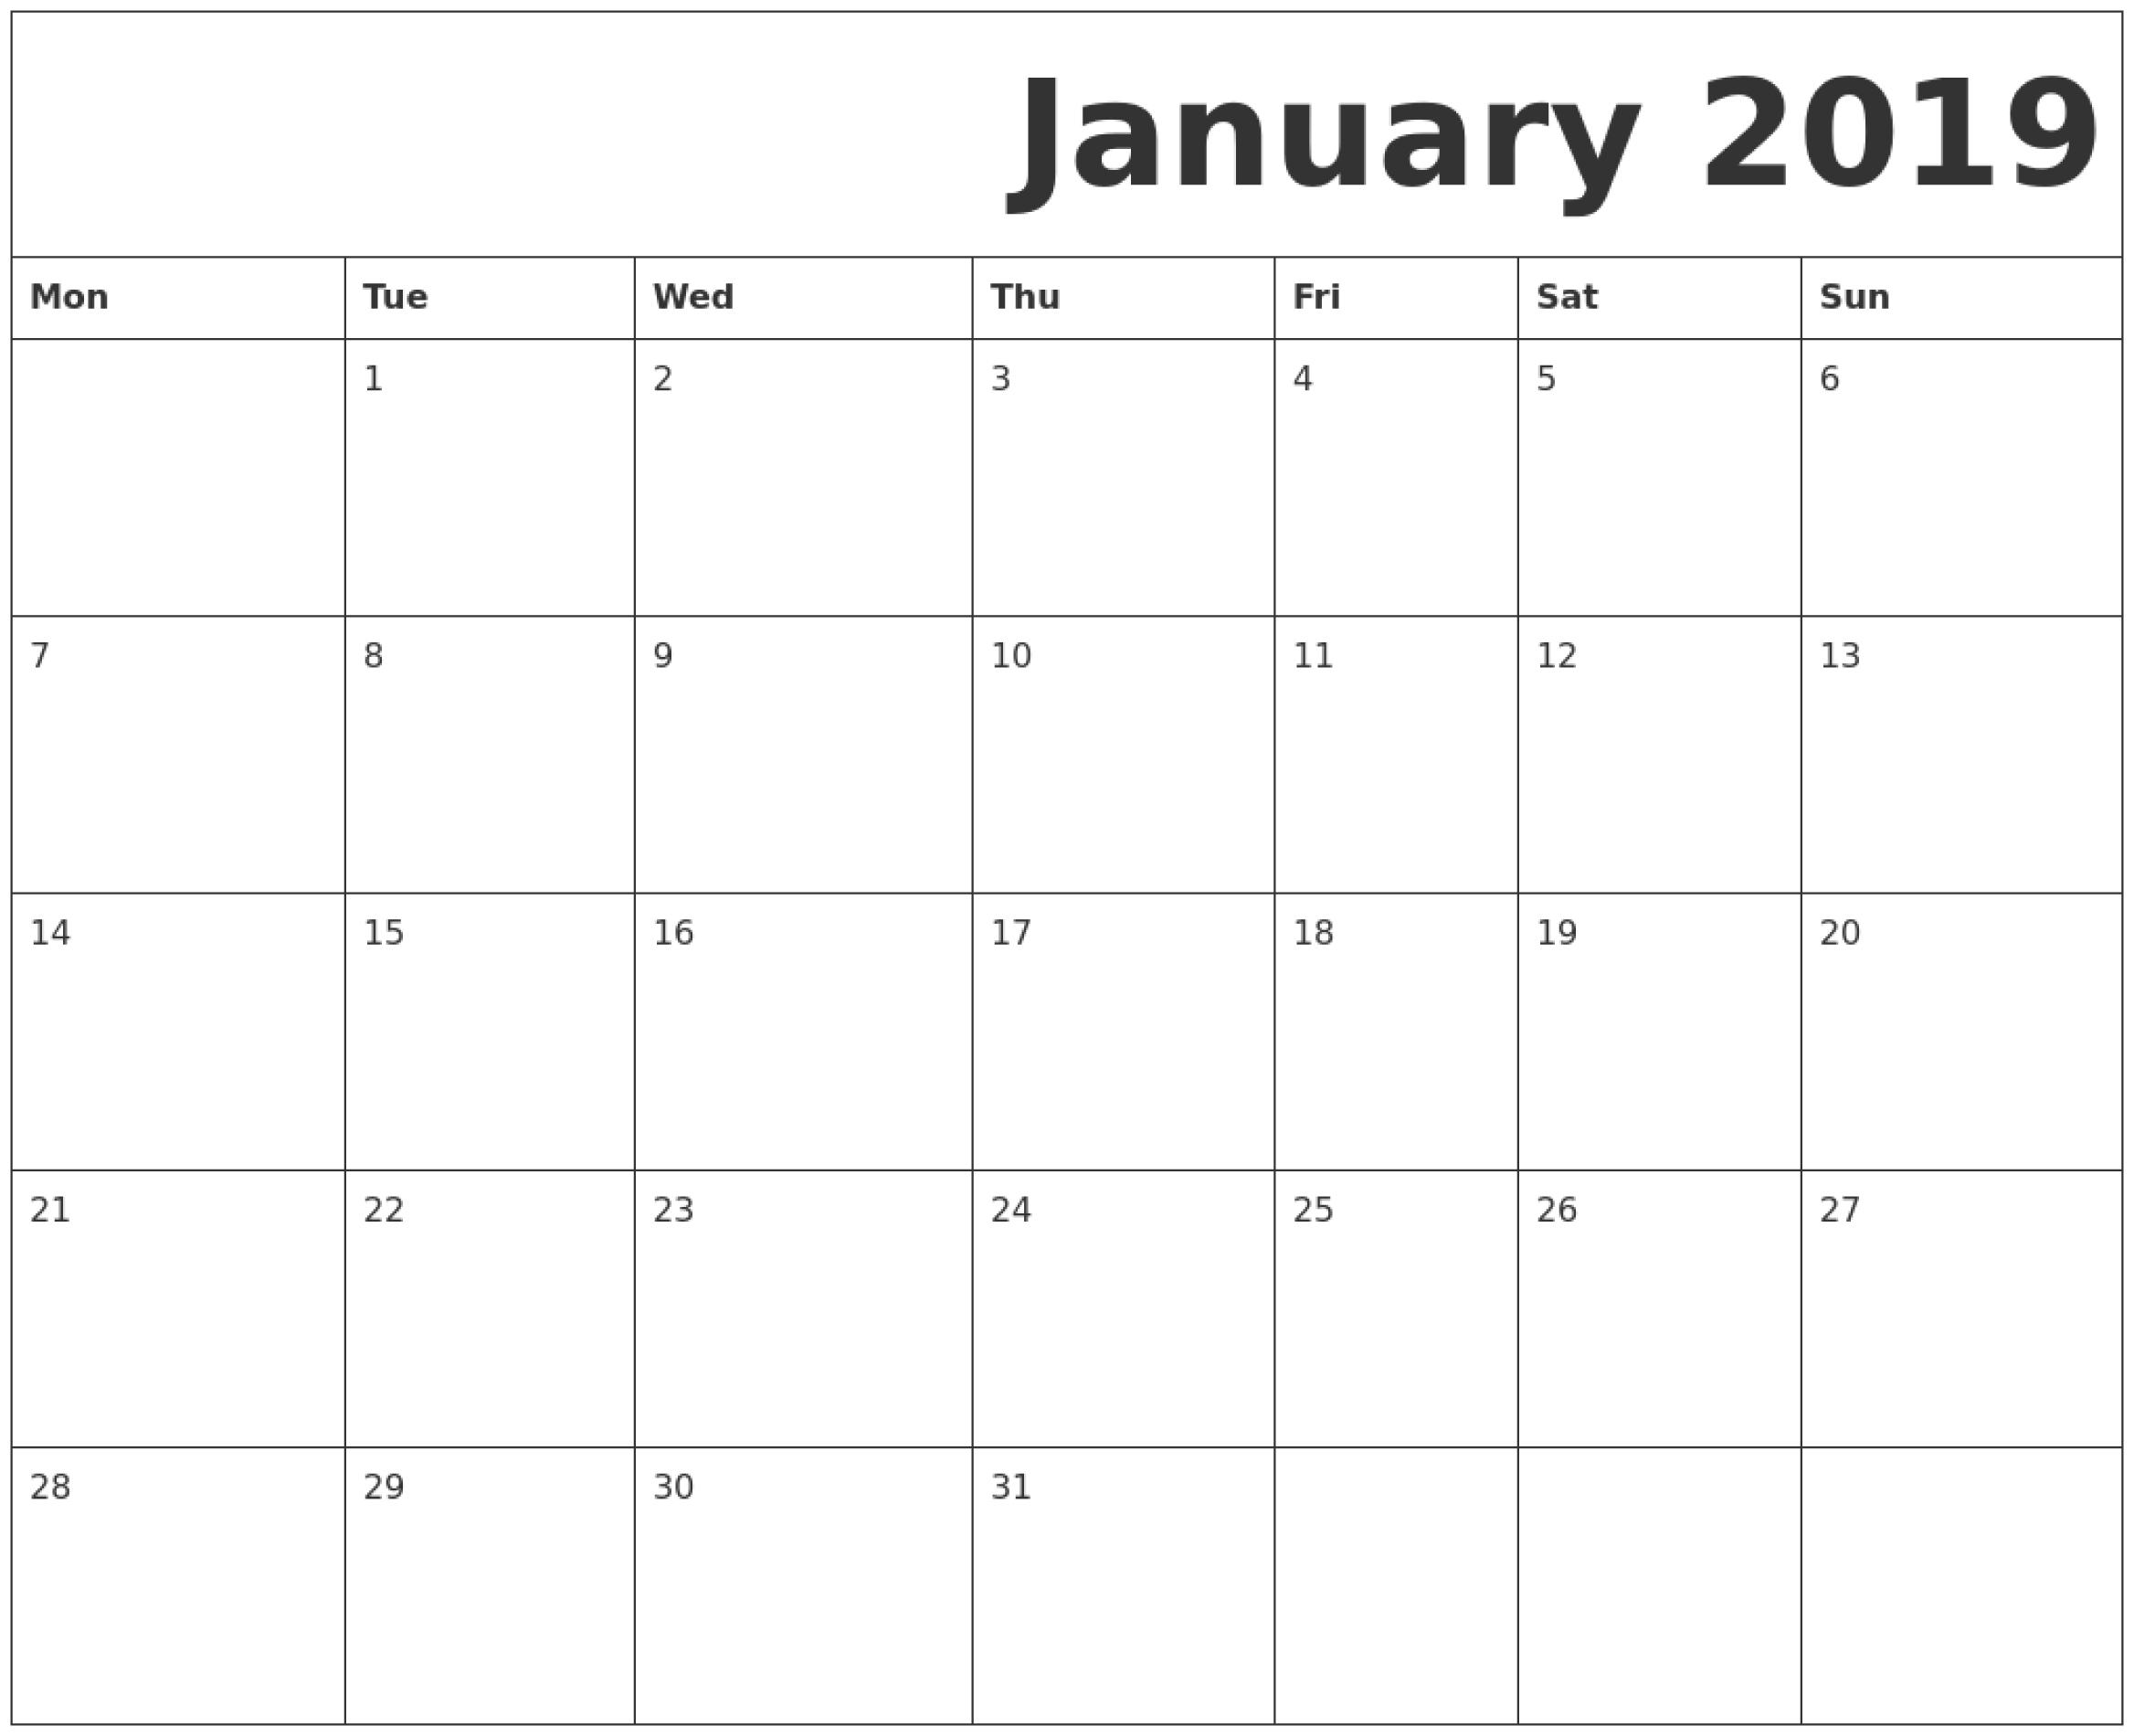 January 2019 Printable Calendar Monday Start. | June Impressive Printable Monthly Calendar Monday Start